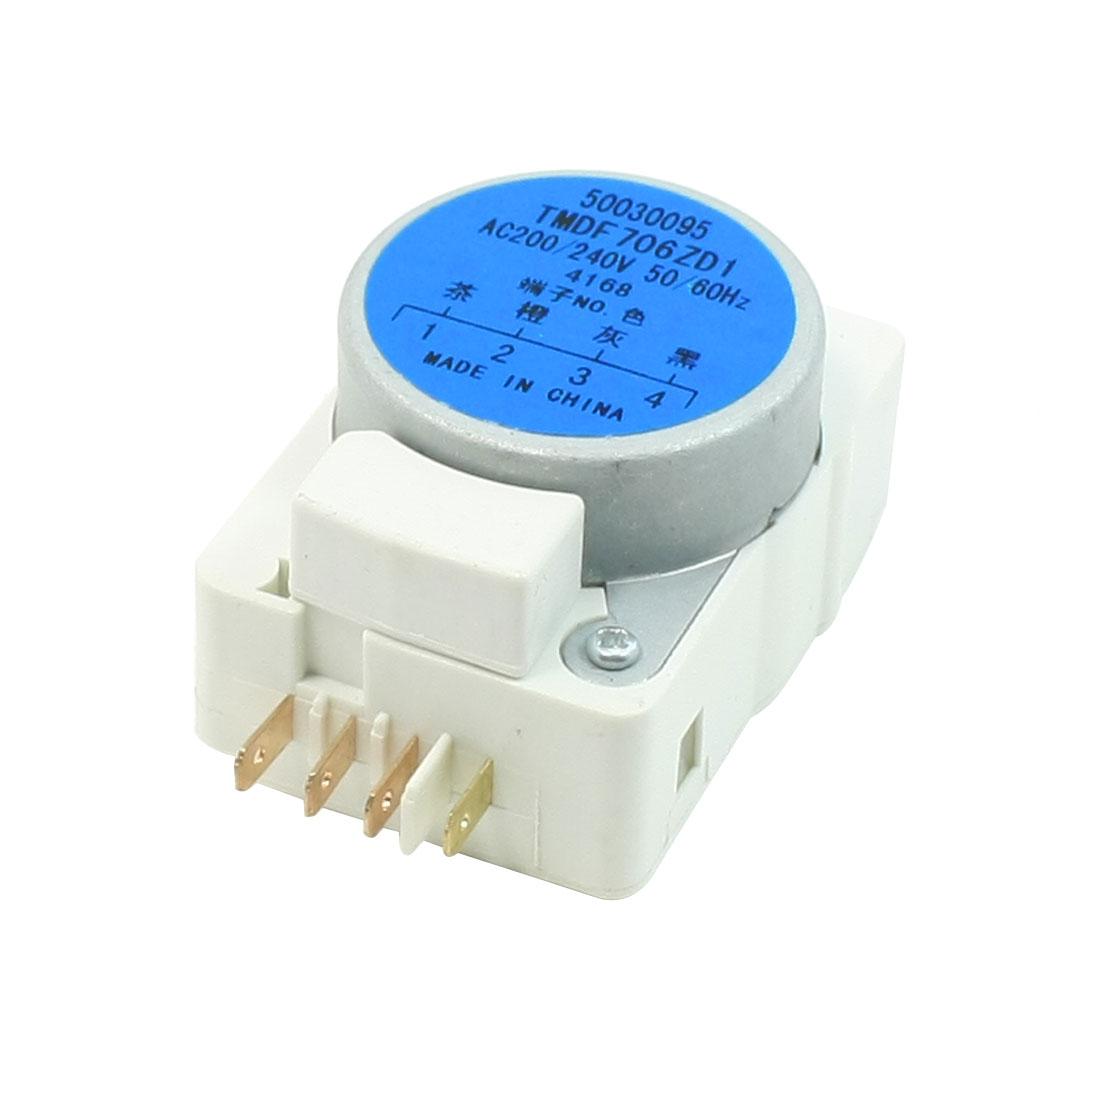 4-Color Wire Terminals Refrigerator Defrost Timer AC200V/240V 50/60Hz TMDF706ZD1